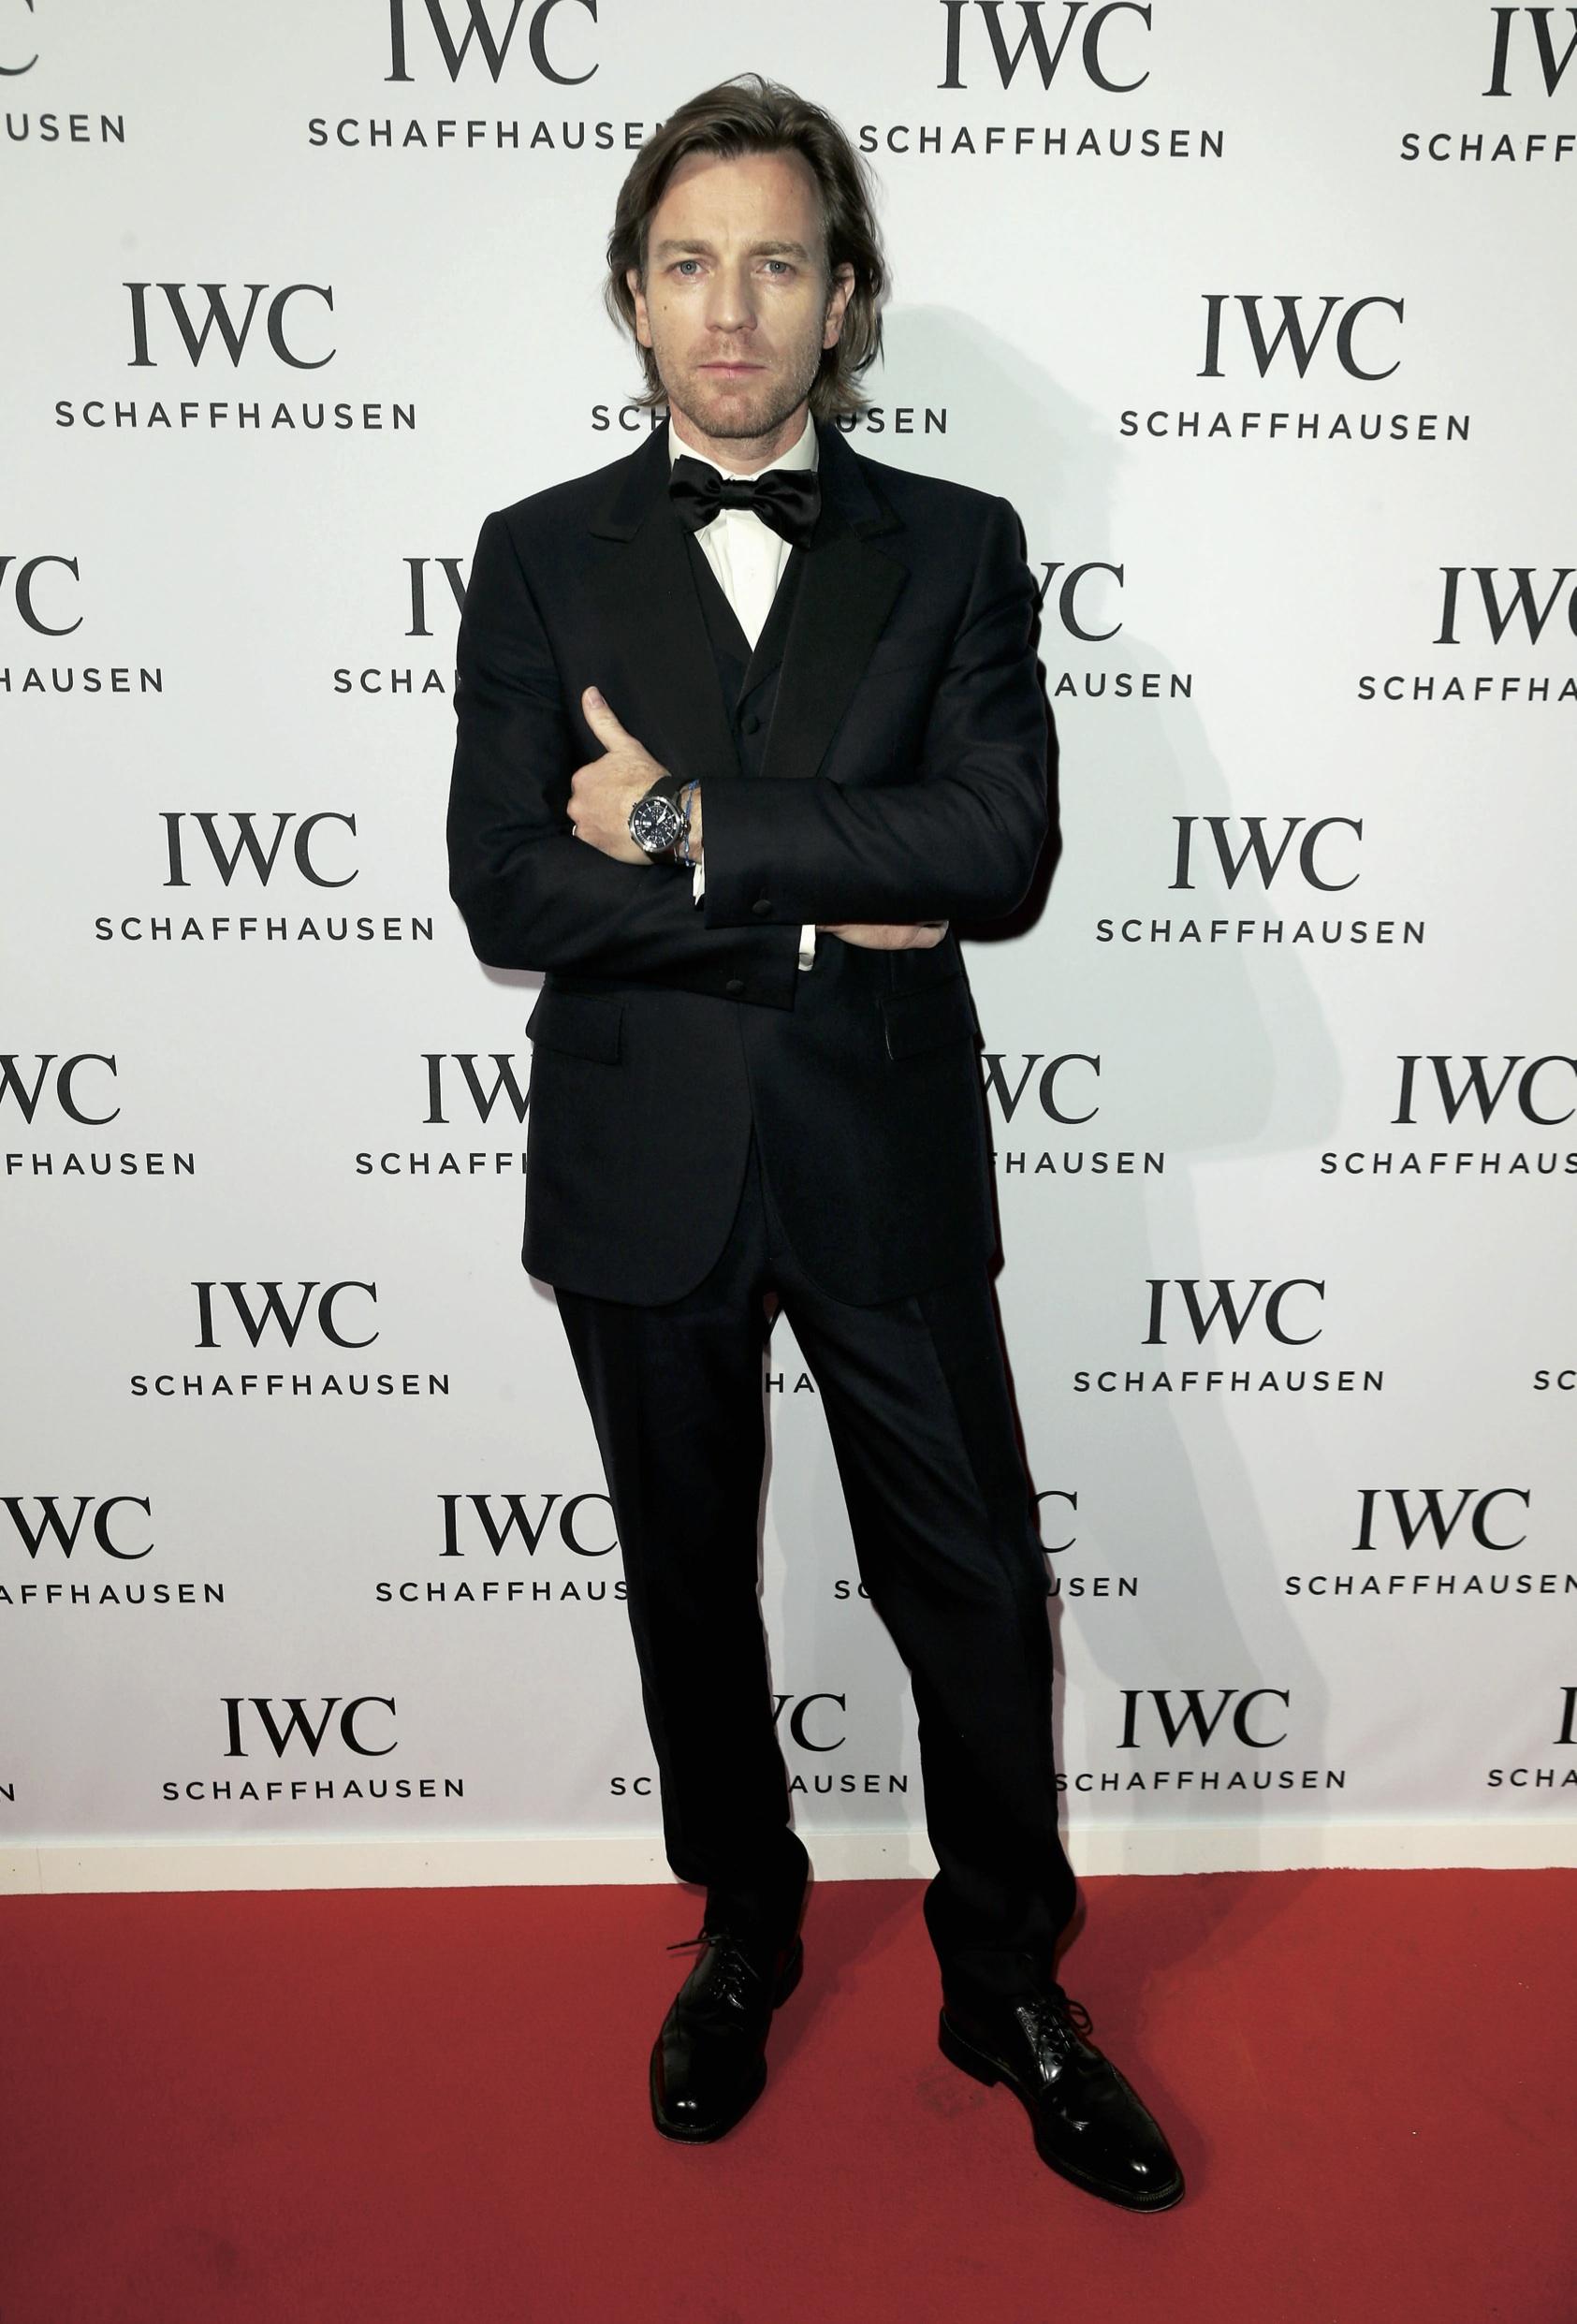 Ewan McGregor in IWC.